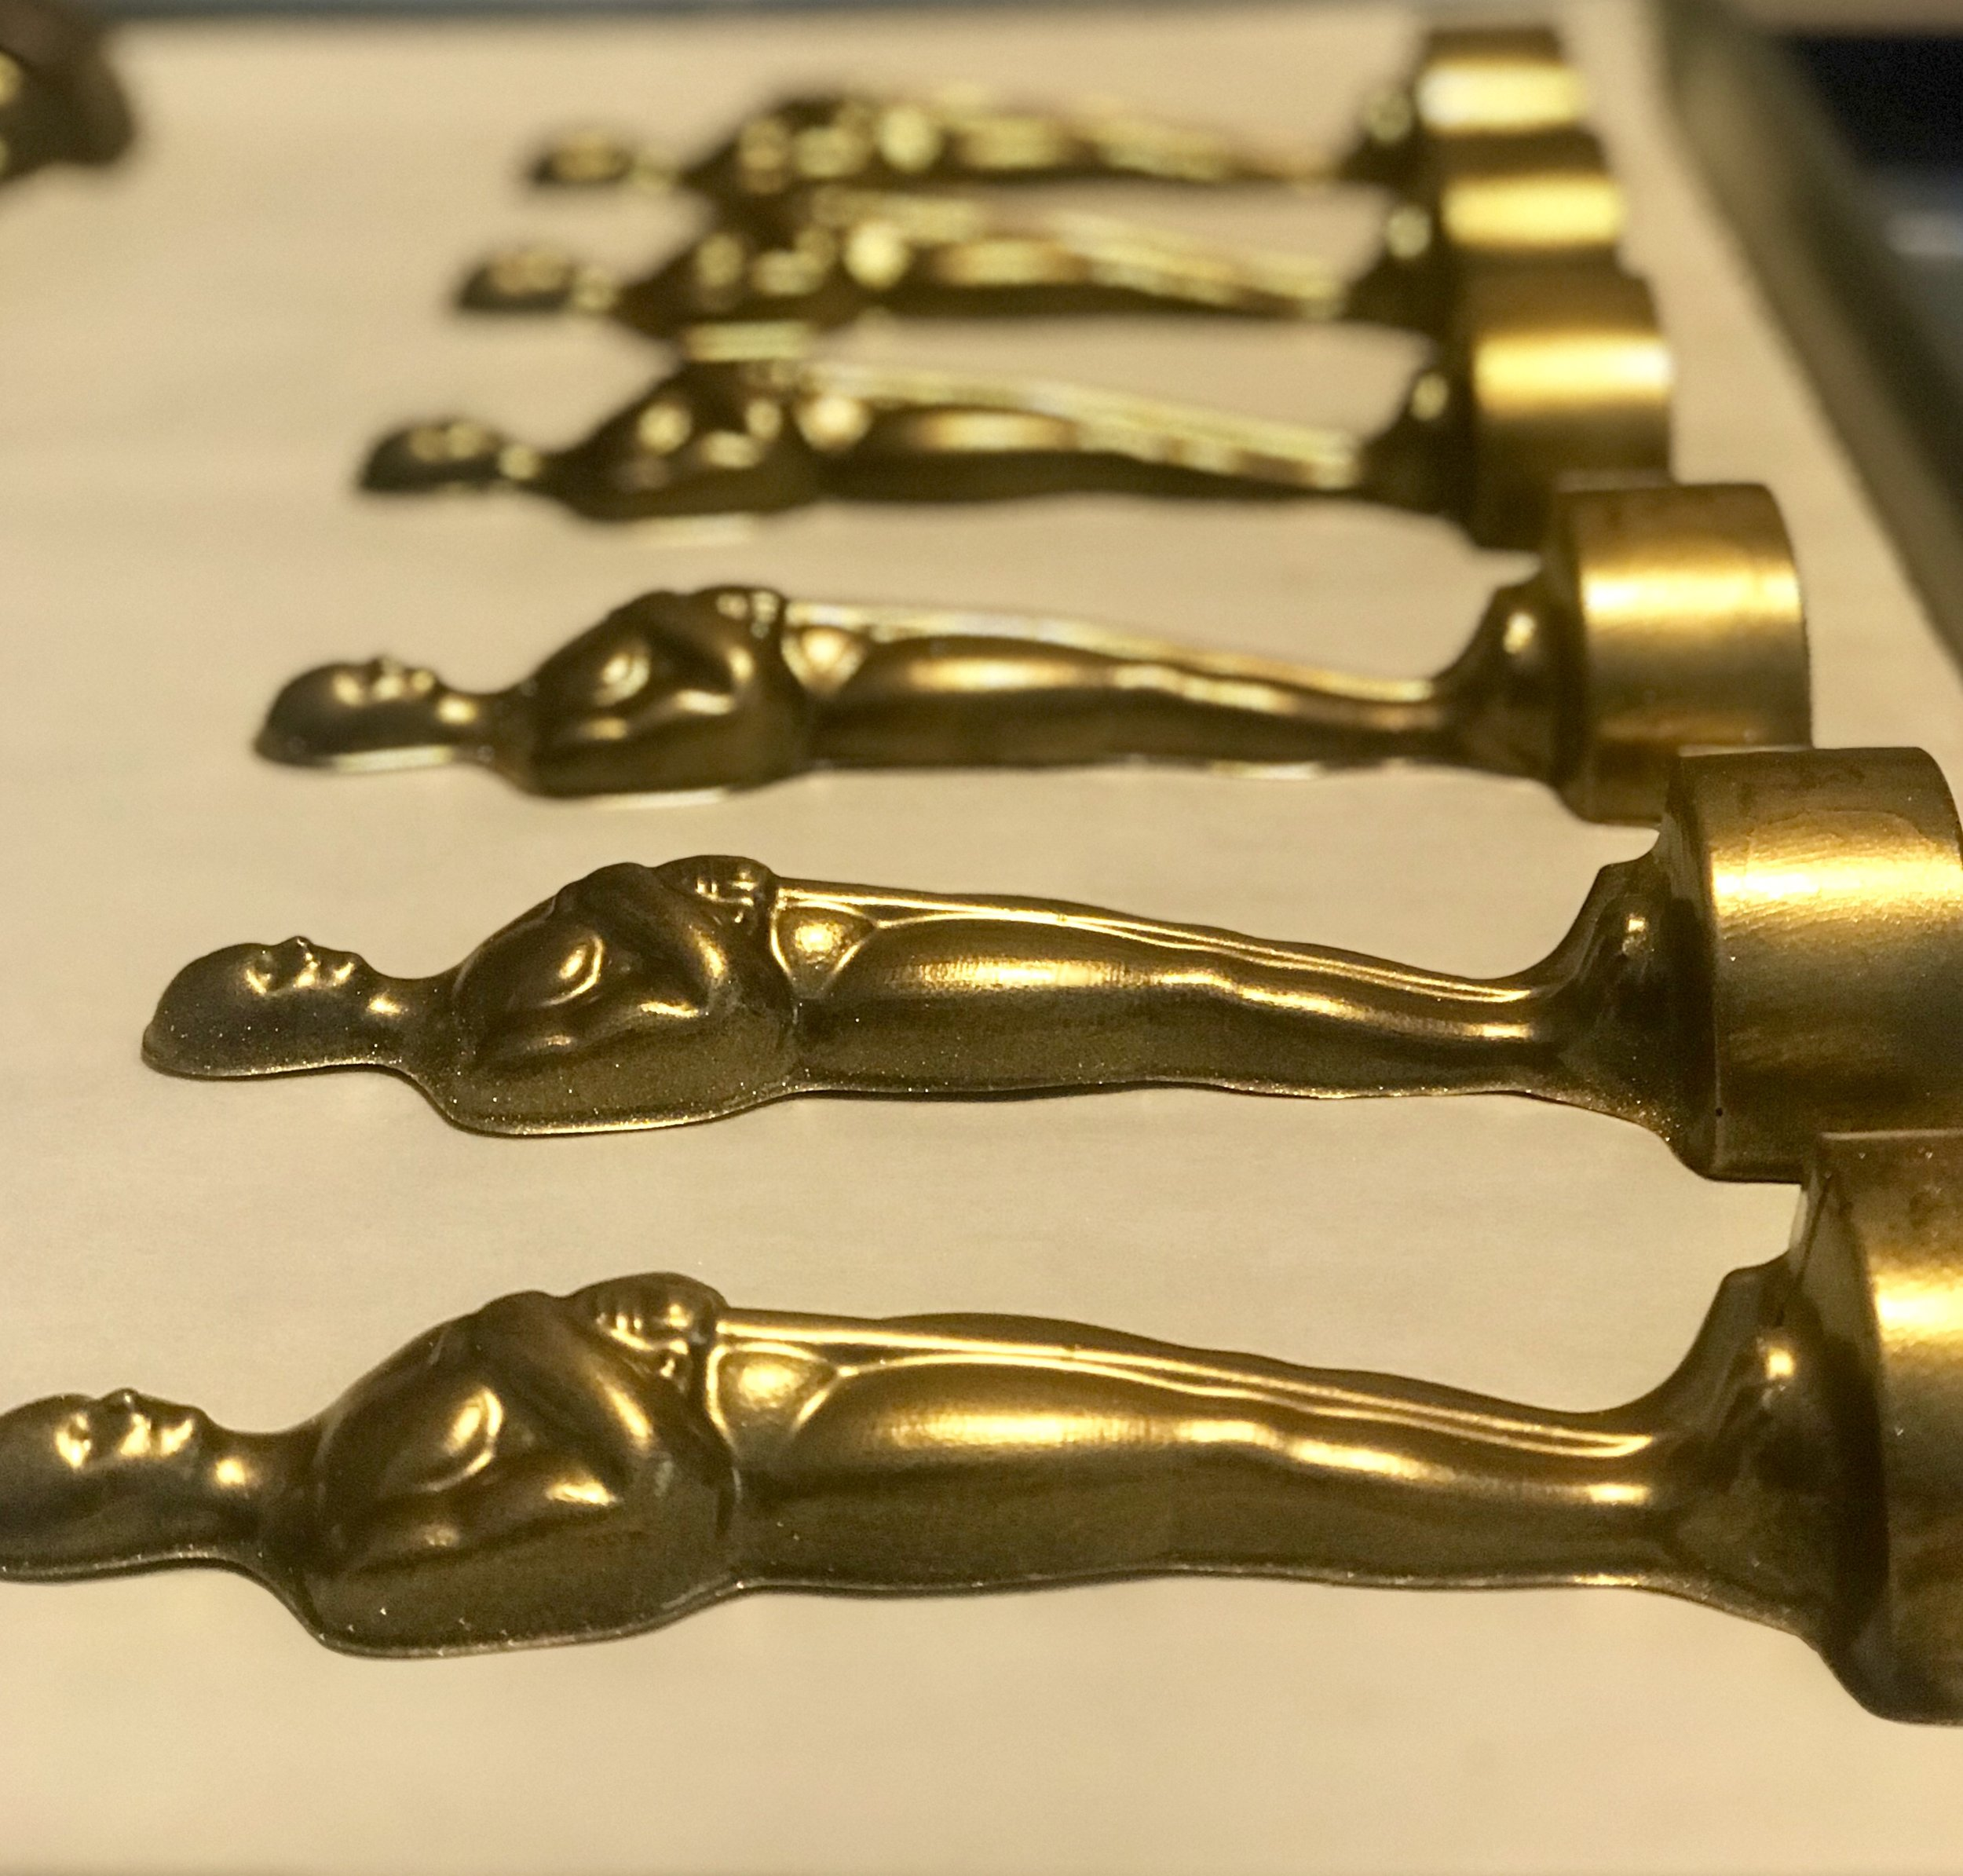 Gold Chocolate Oscar Statues